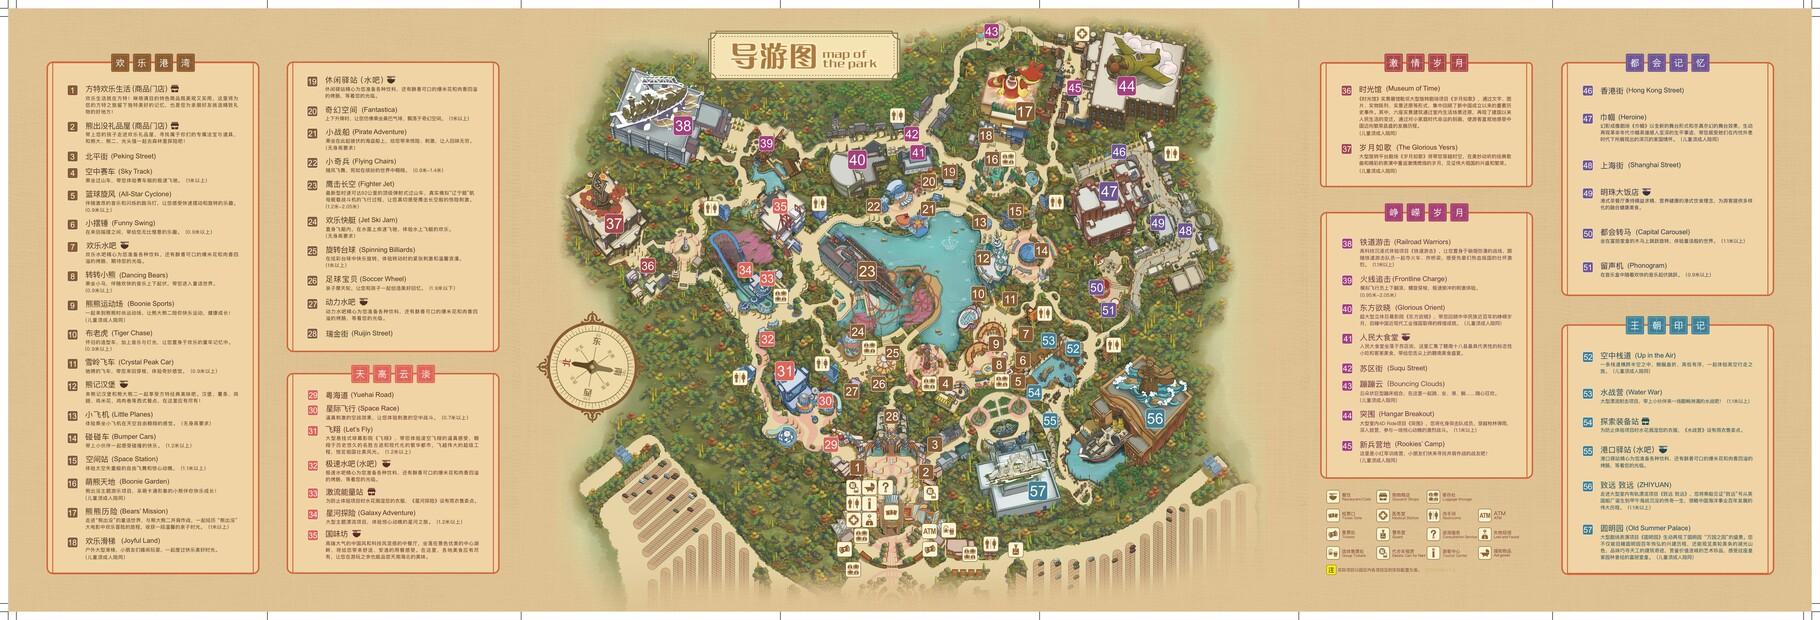 fantawild-theme-parks-88649200.jpg